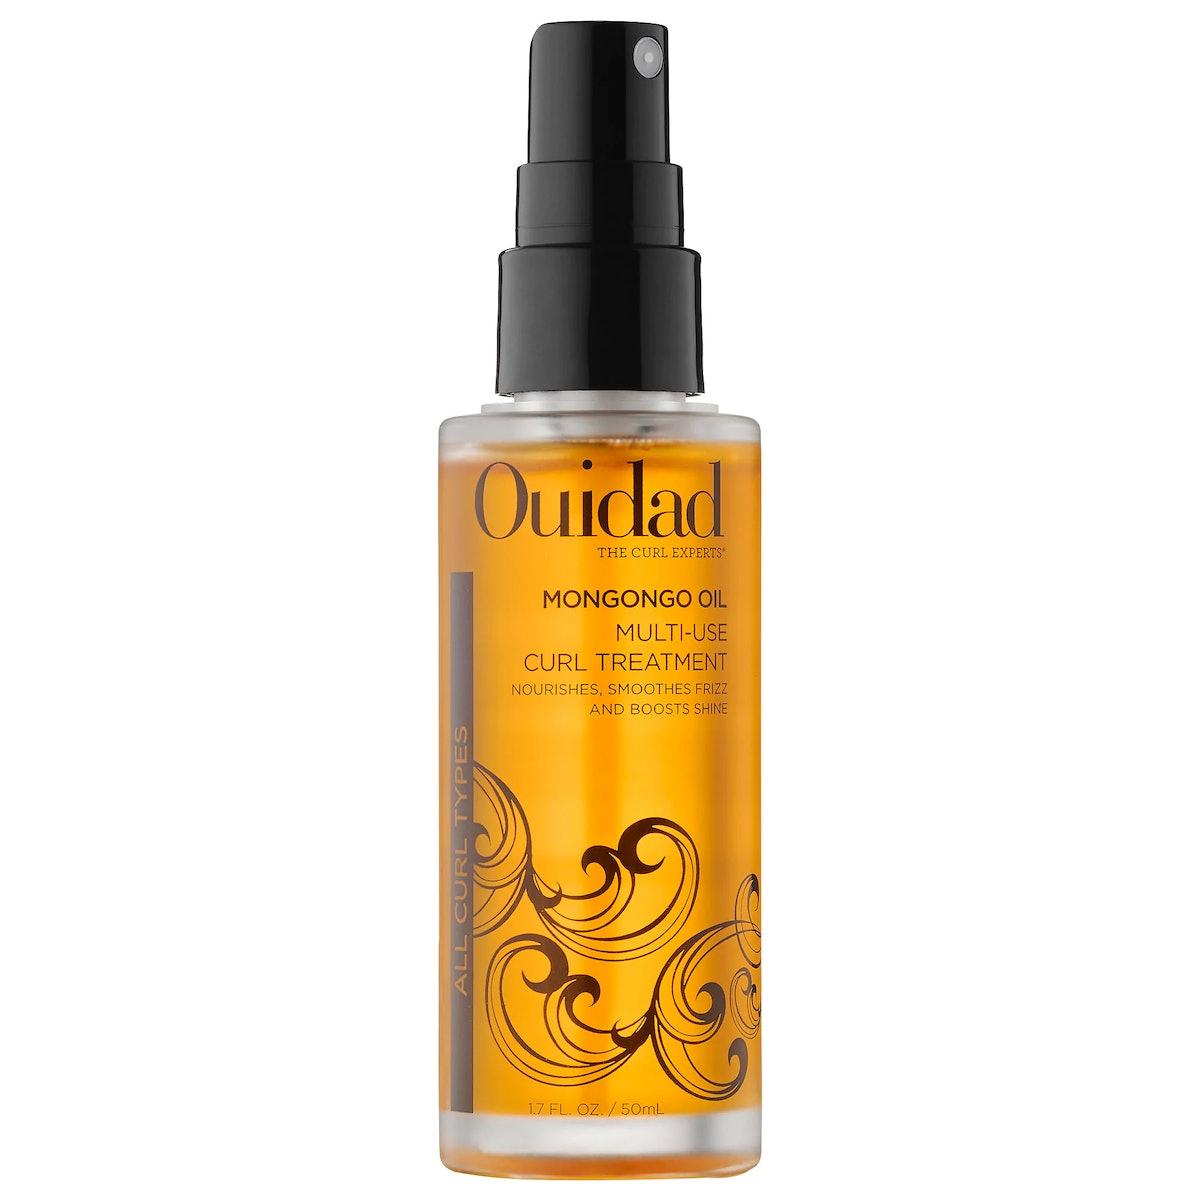 Mongongo Oil Multi-Use Curl Treatment